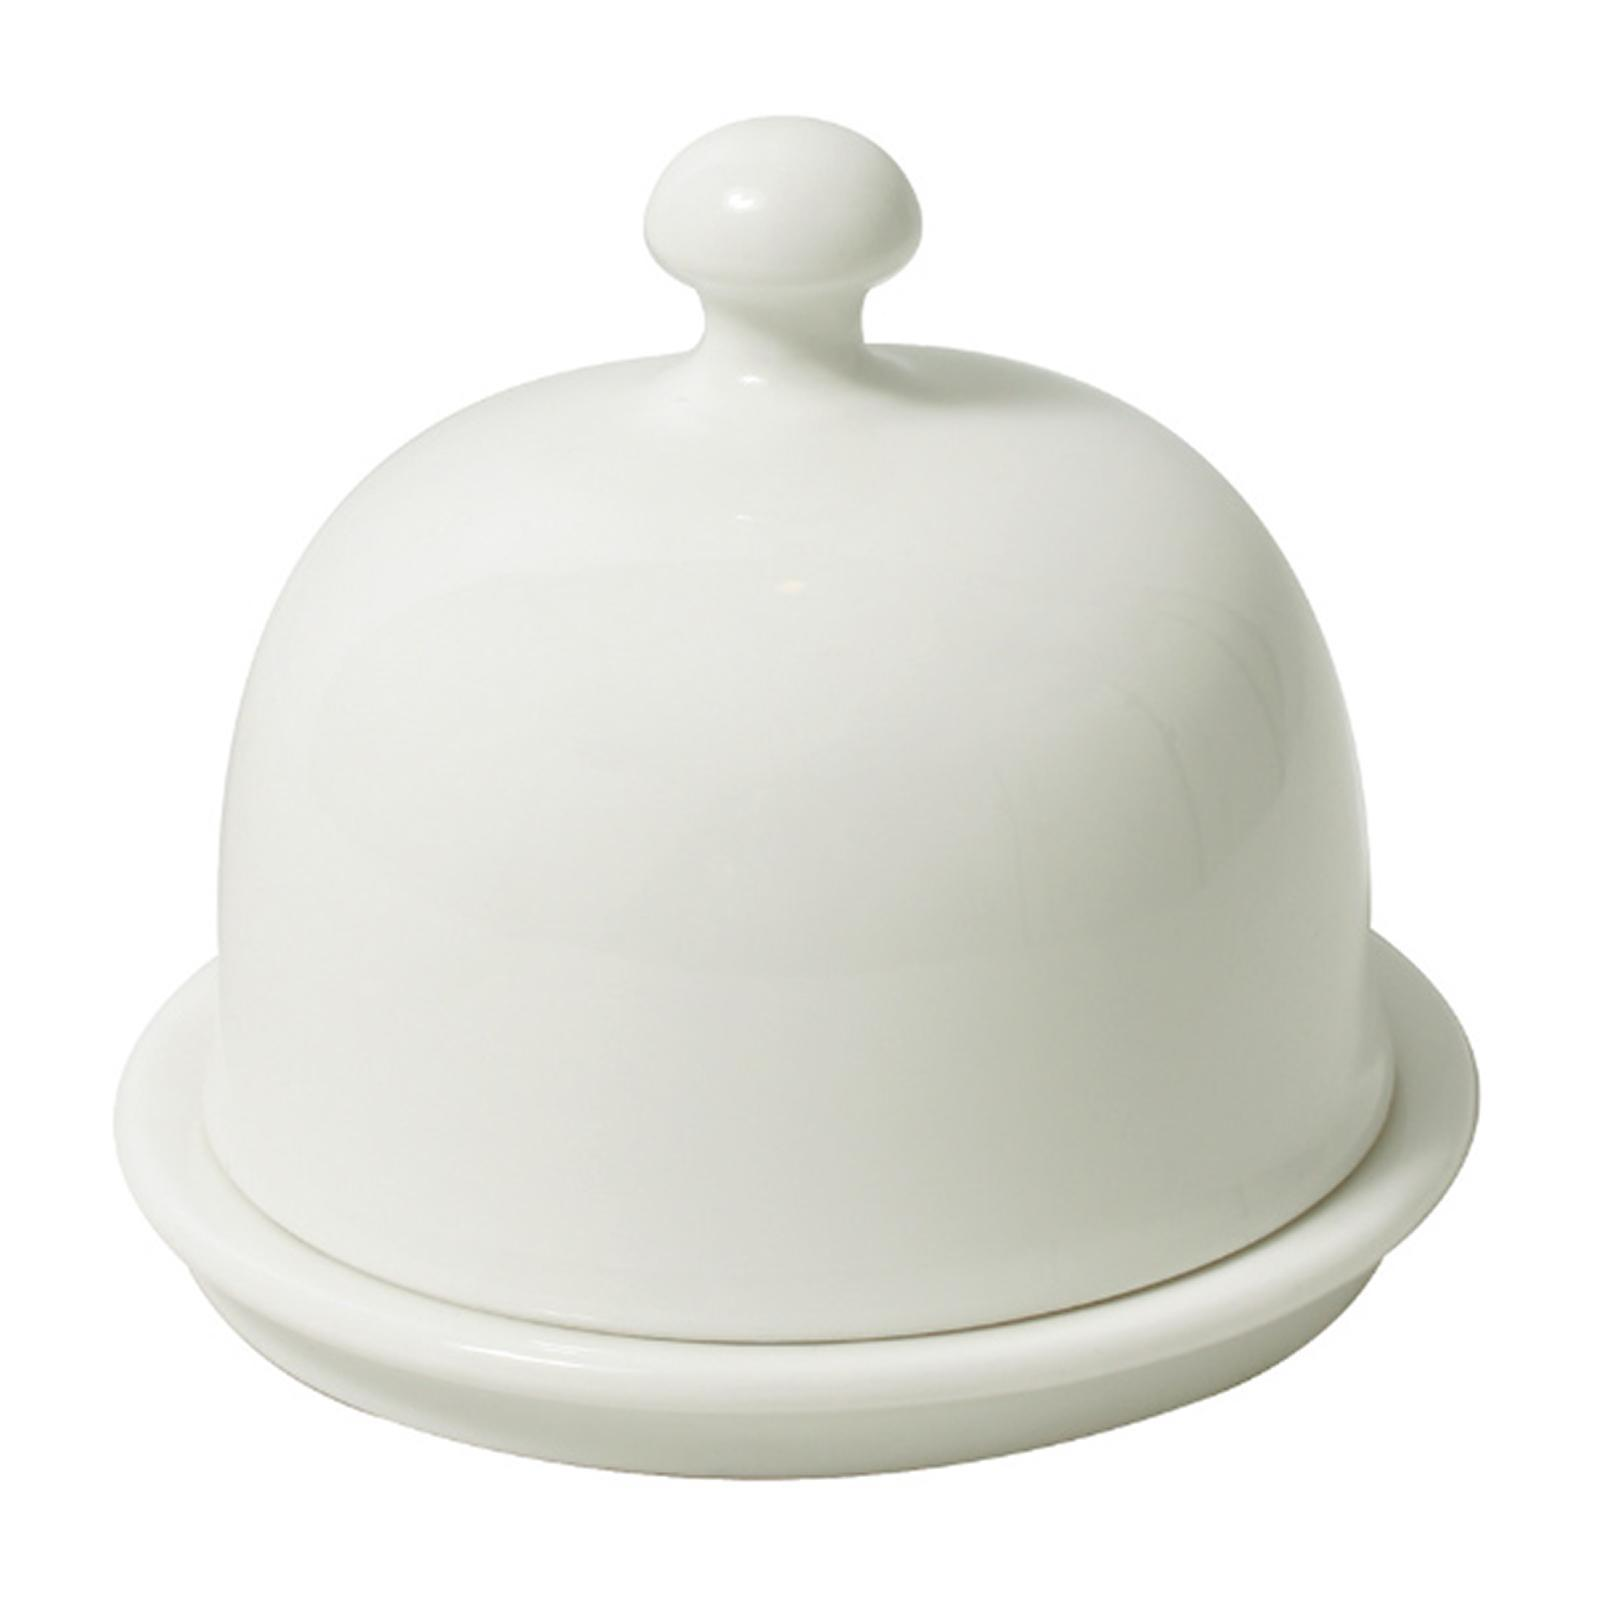 Cerabon Essentials Porcelain Mini Butter Dish With Cover Diameter 90 x 80MM - By ToTT